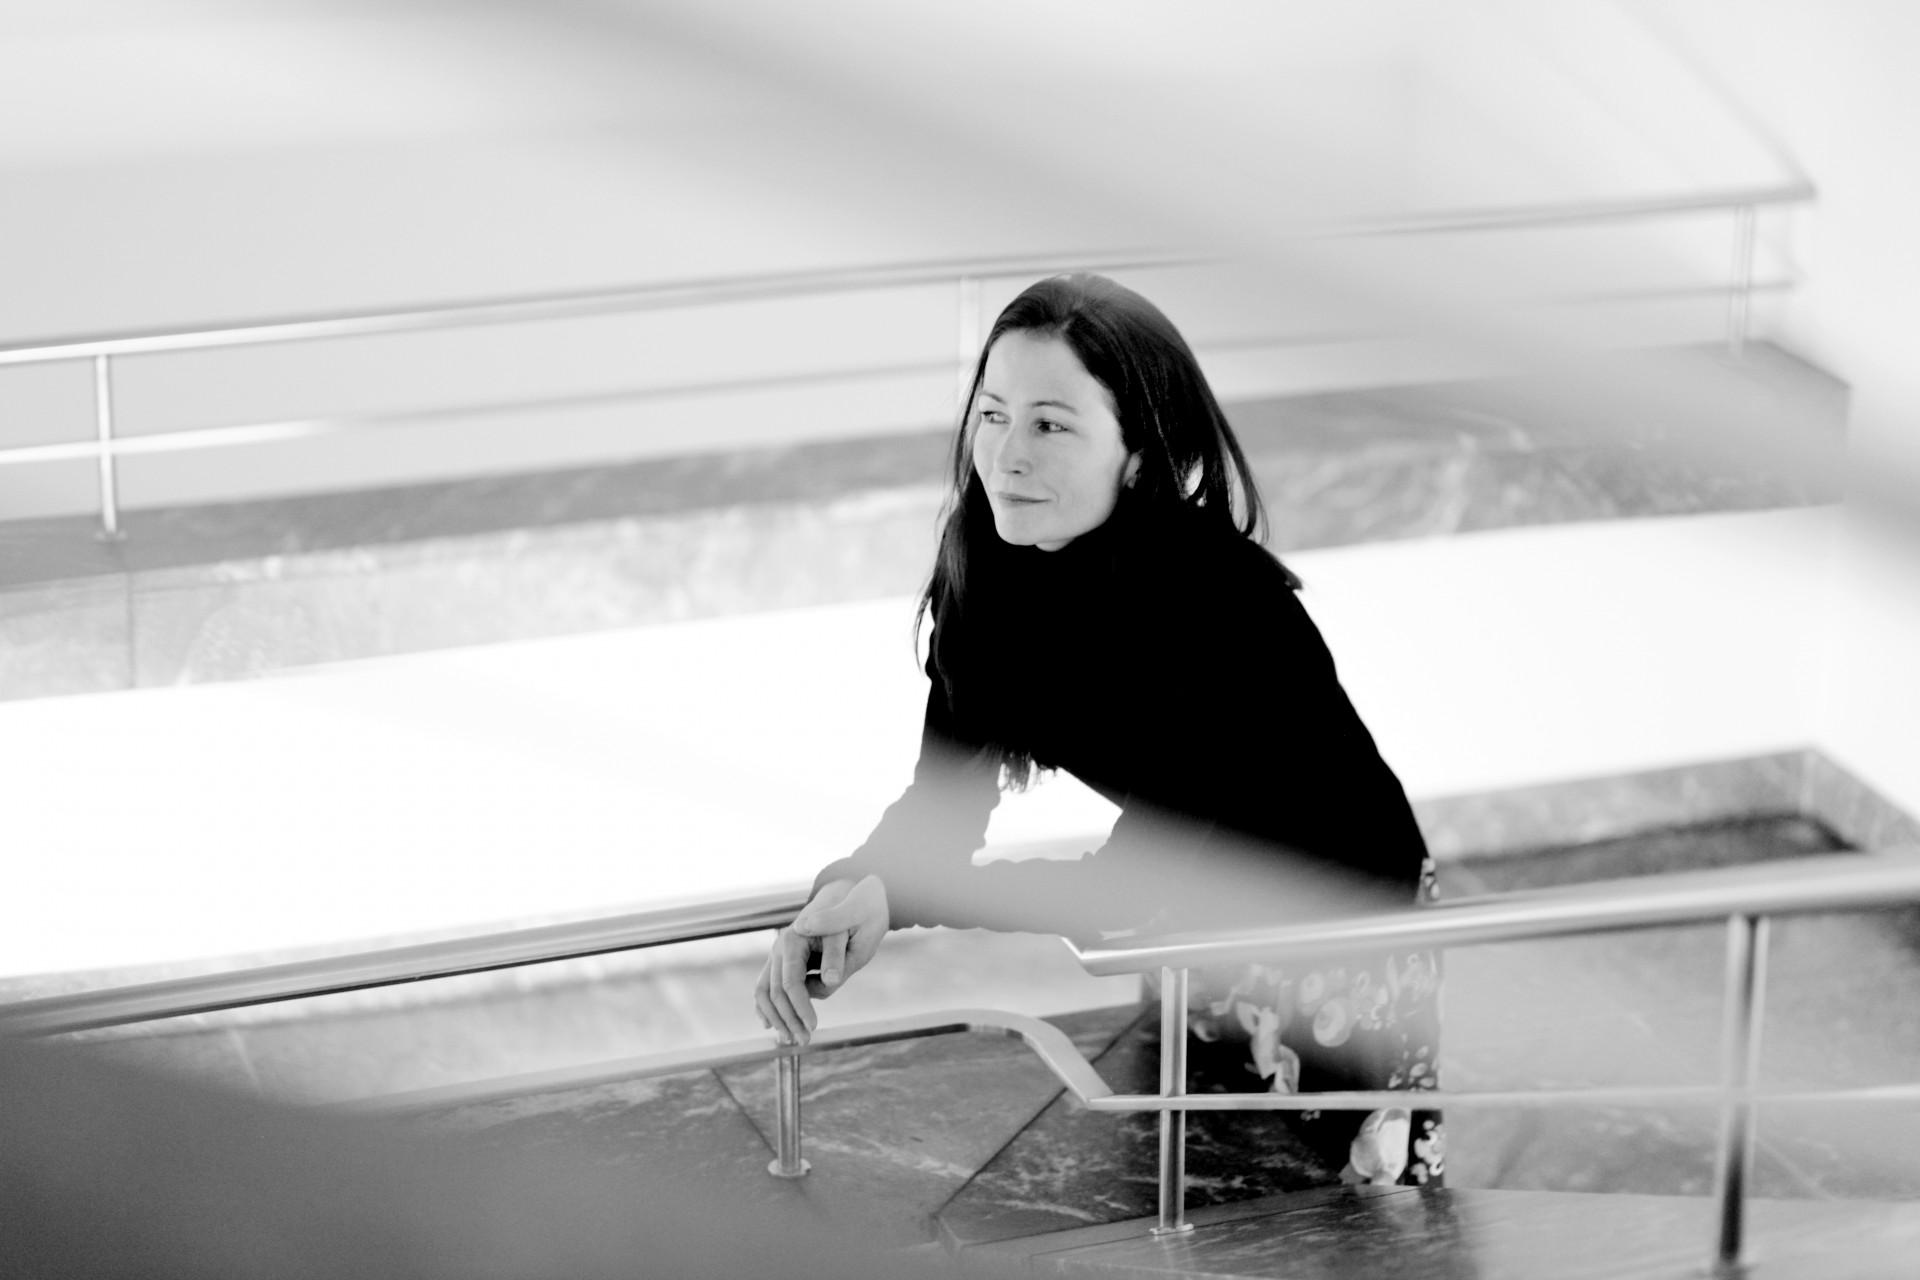 Susanne Abbuehl (photograph by Martin U. K. Lengemann)